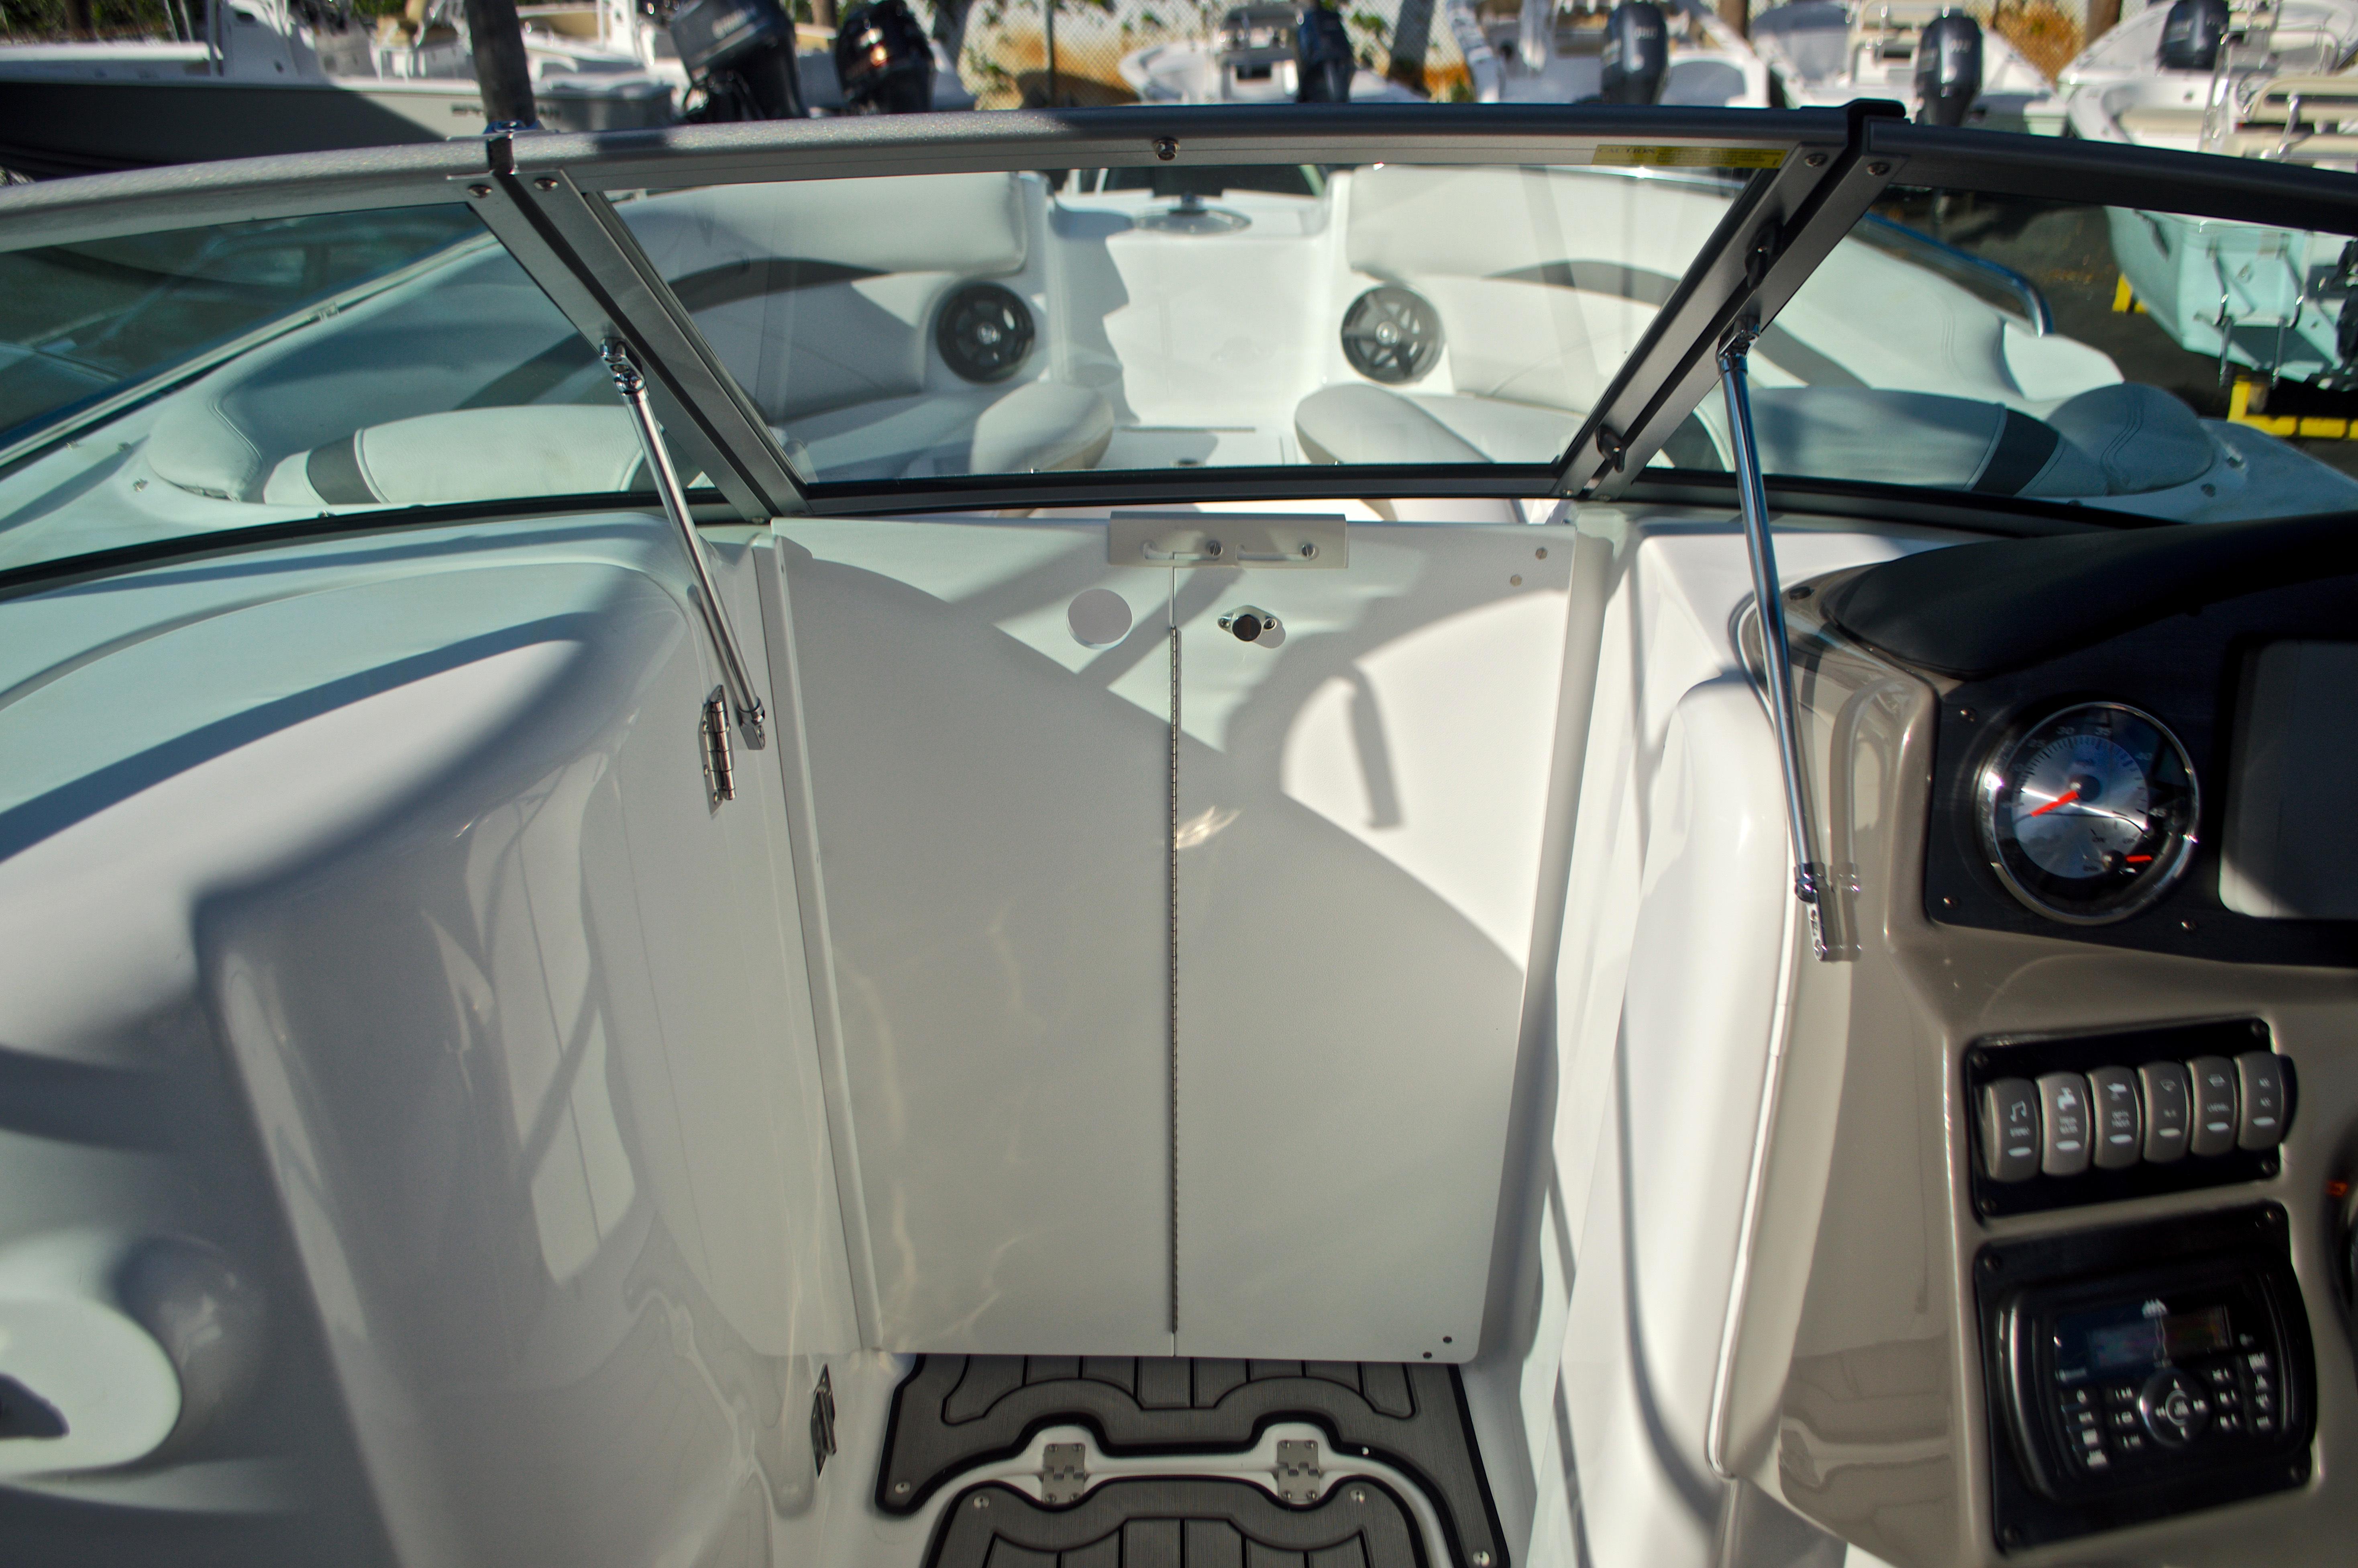 Thumbnail 55 for New 2017 Hurricane SunDeck SD 2400 OB boat for sale in Miami, FL